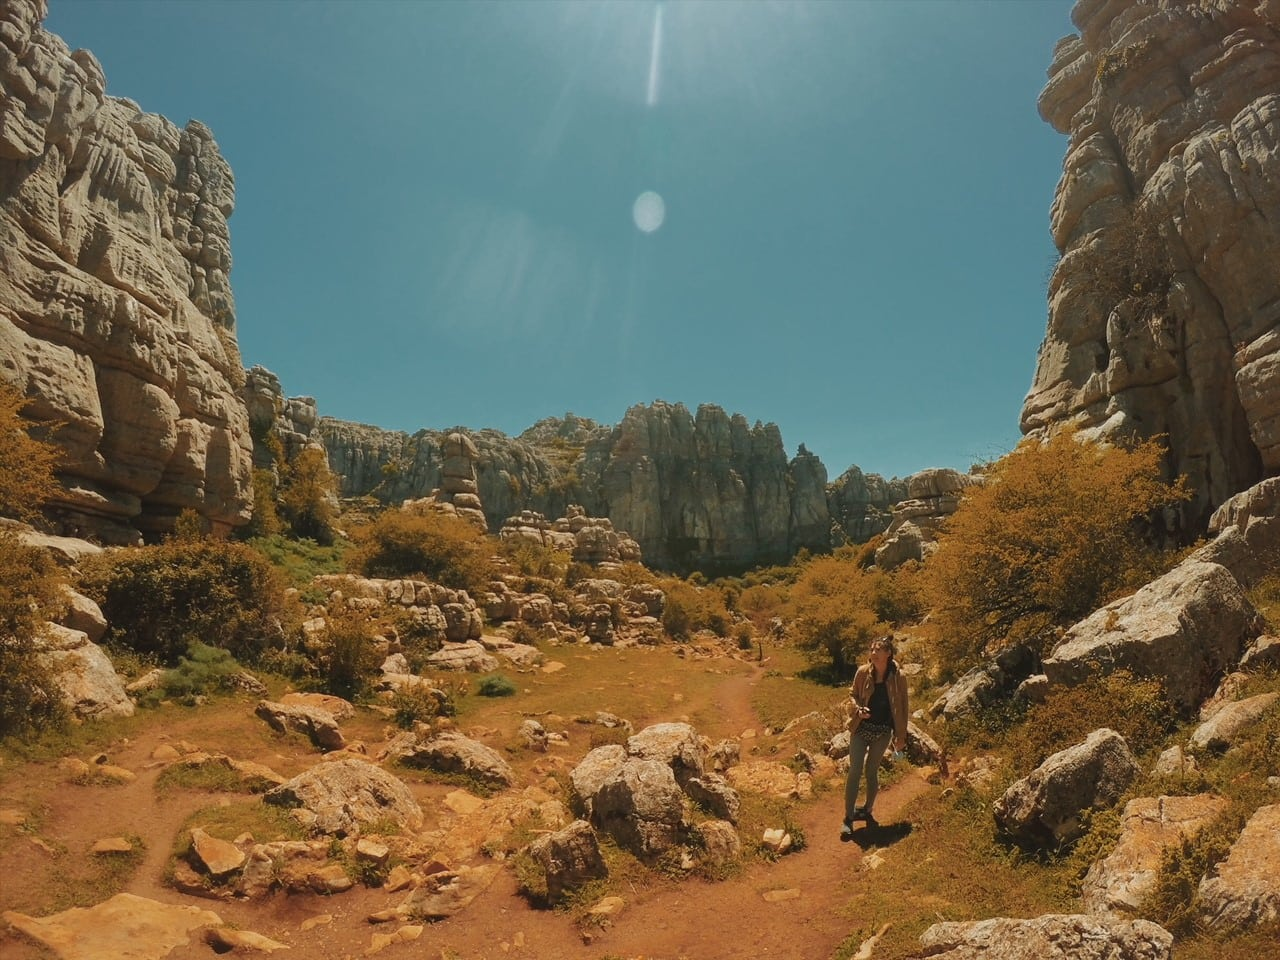 El Torcal de Antequera majówka andaluzja neverendingtravel.pl trekking, skały, górski spacer, trasa, szlak w górach, ścieżka, rezerwat, park narodowy